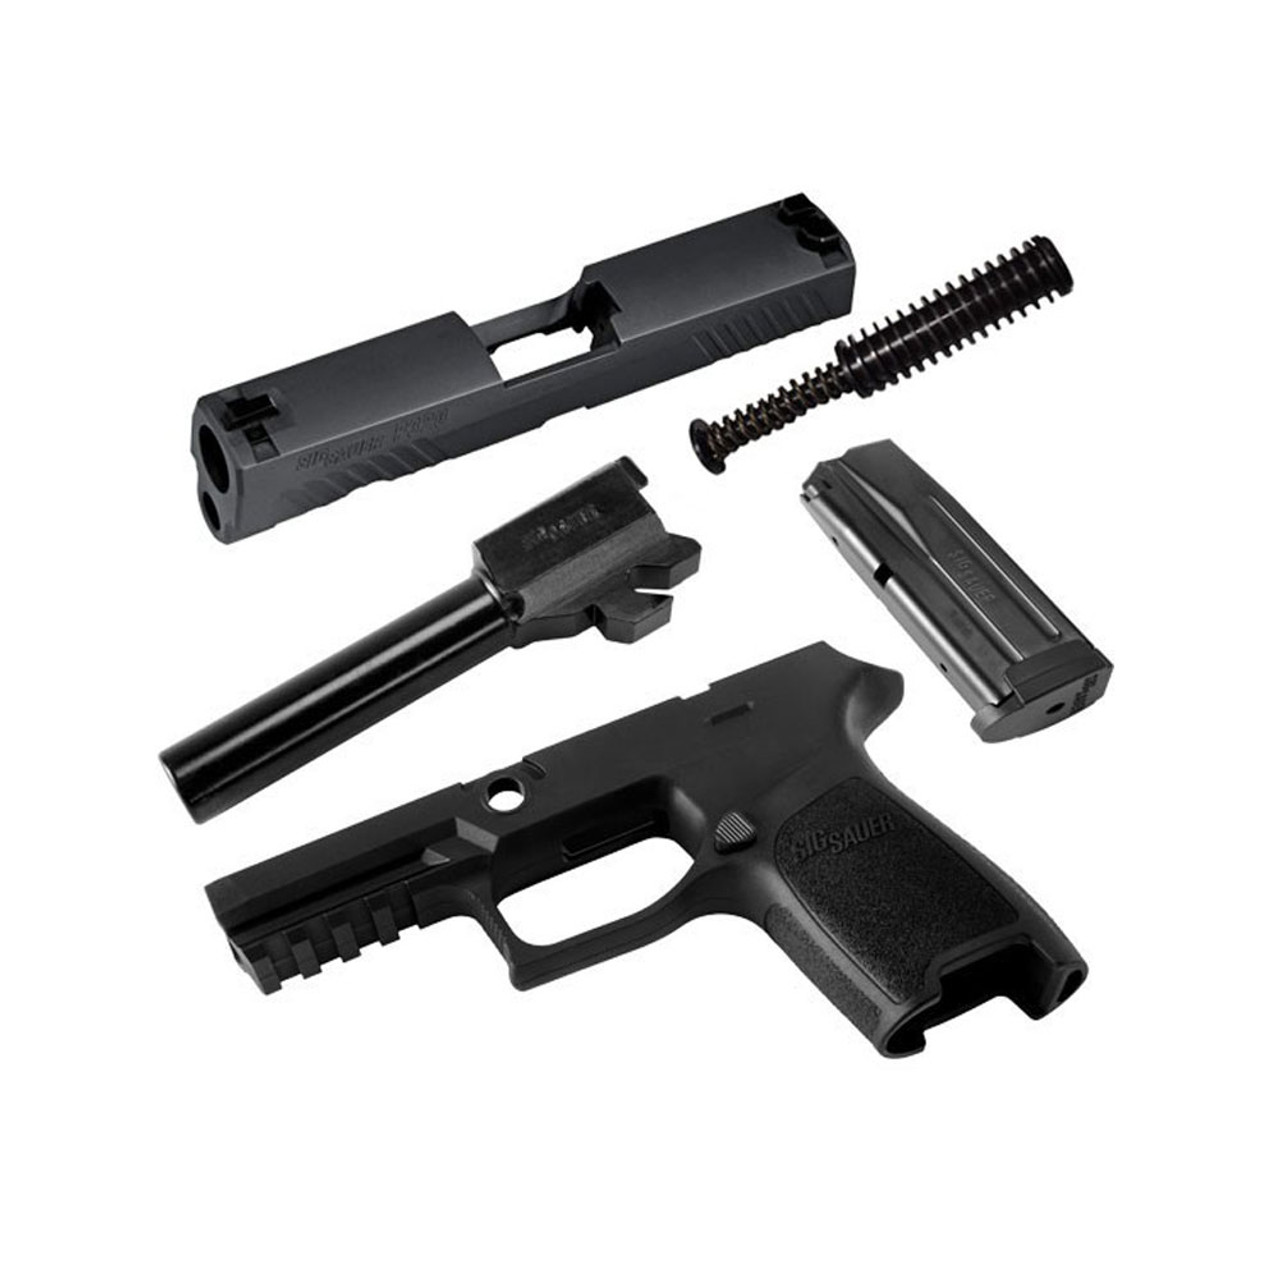 sig sauer p320 compact 9mm 15rd mag black caliber x change kit calx  [ 1001 x 1001 Pixel ]